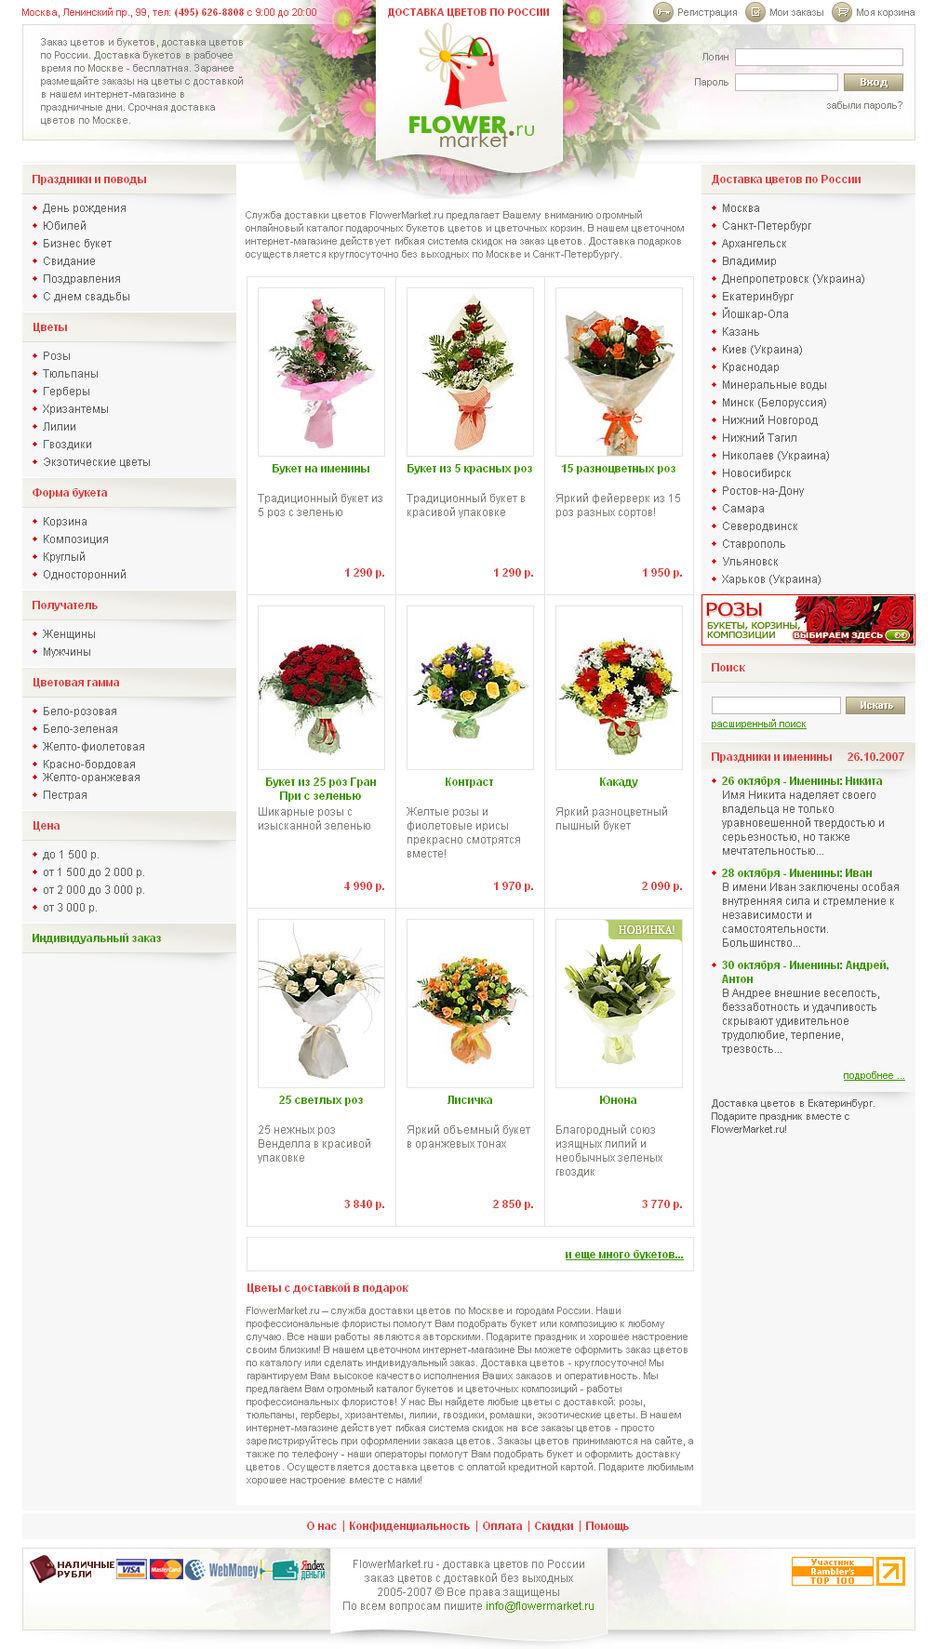 Йошкар ола заказ цветов интернет магазин, доставка